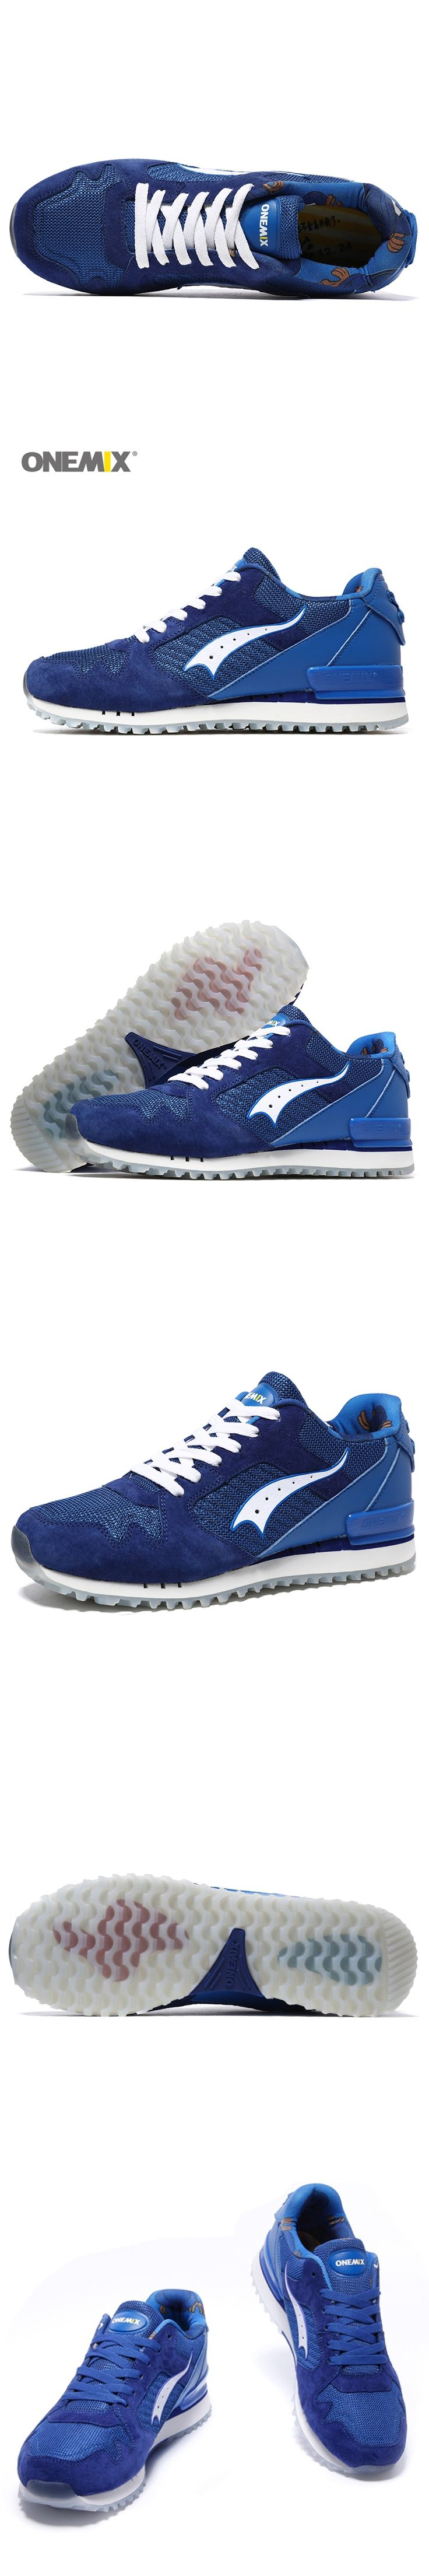 ONEMIX retro sports shoes breathable portable shoes men walking sports jogging shoes outdoor sports EU39-45 1112